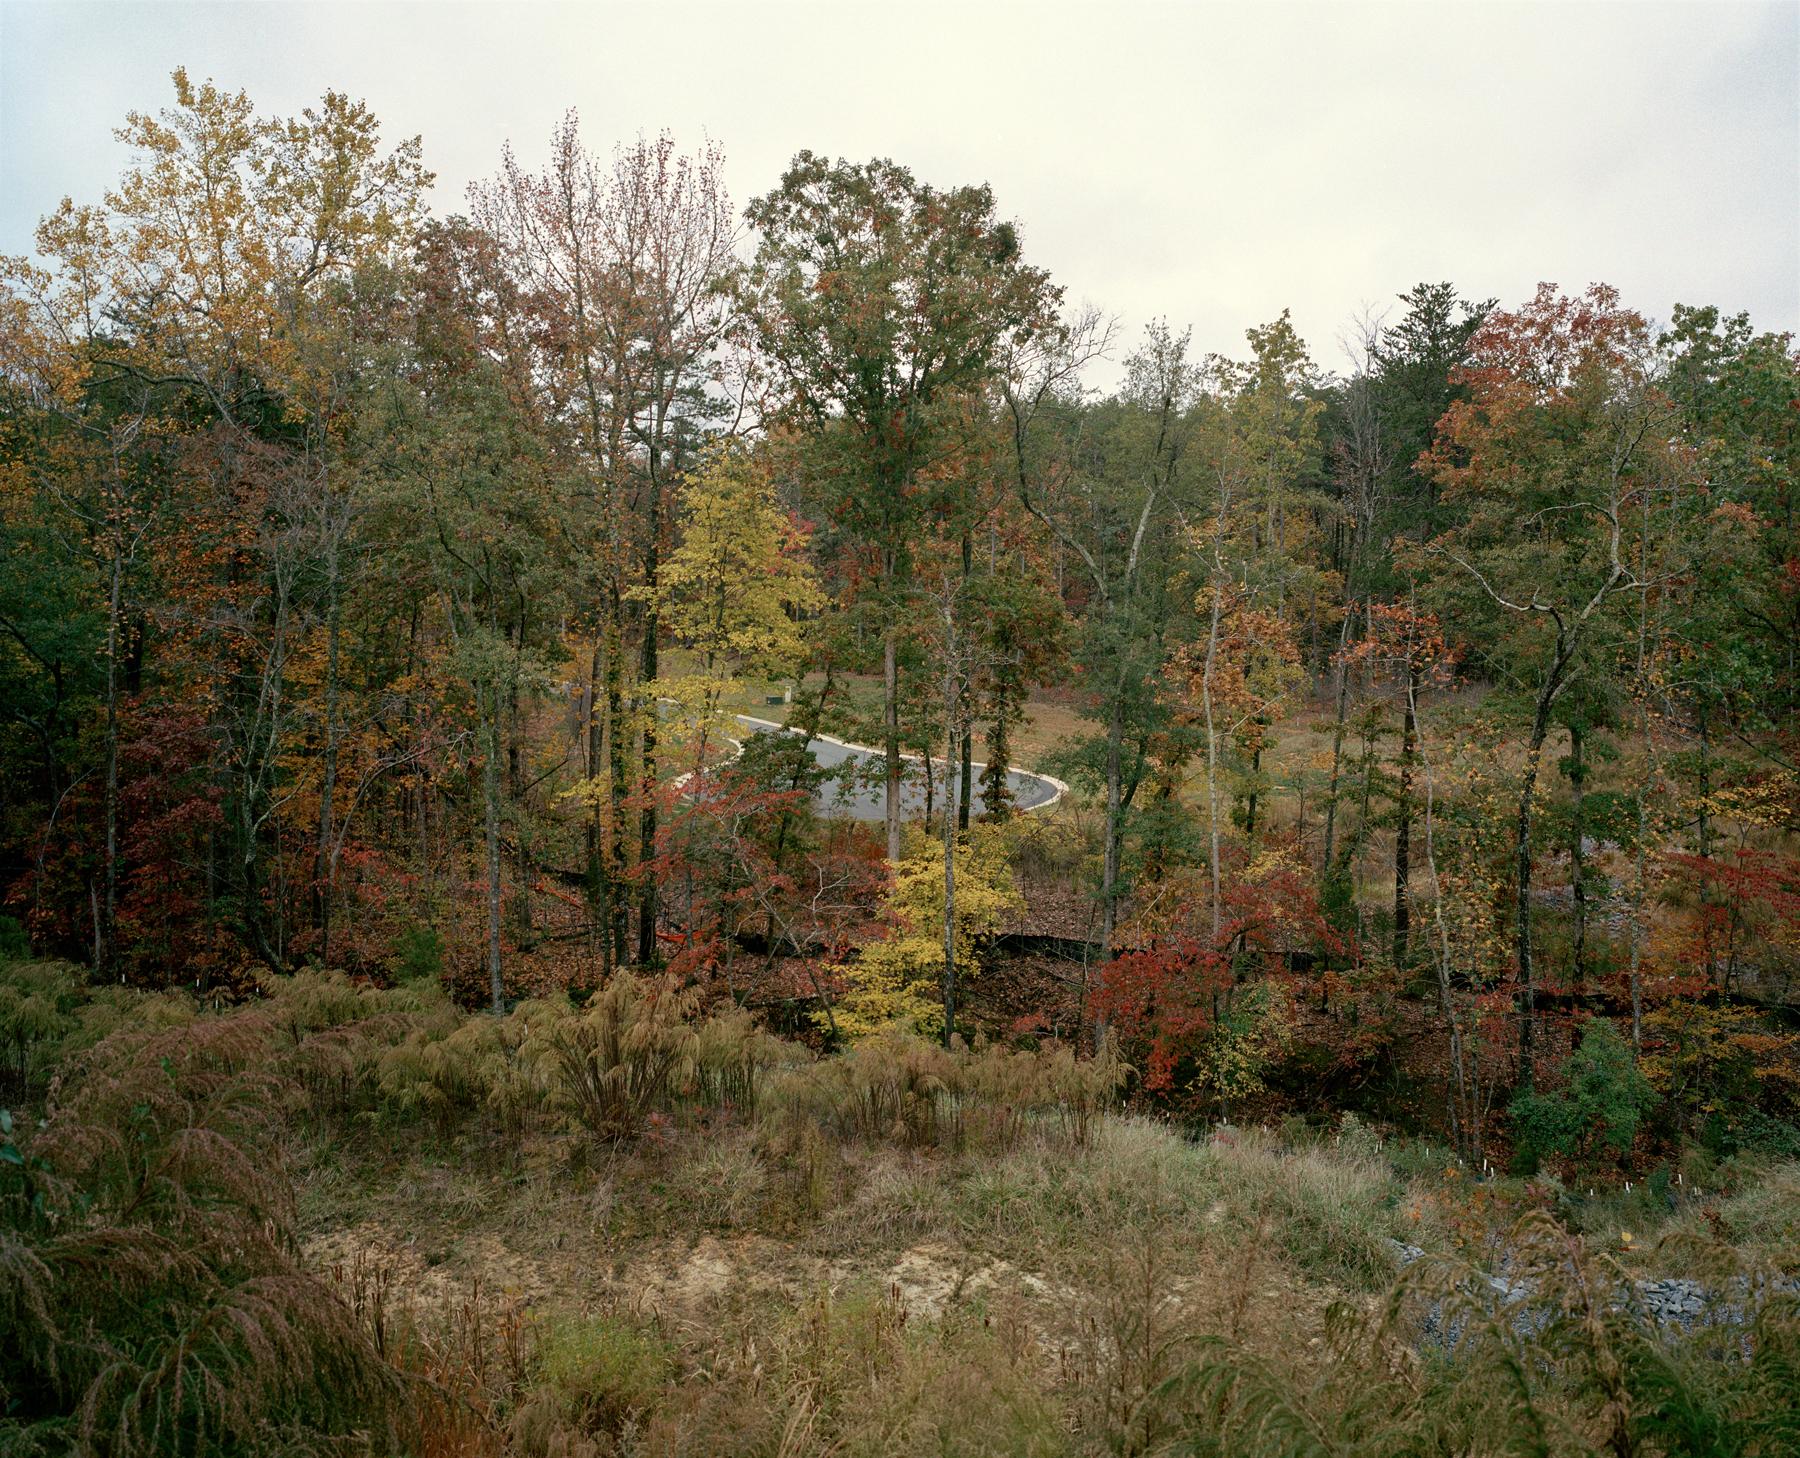 Cul-de-sac, Lake Waylie, NC. 2009